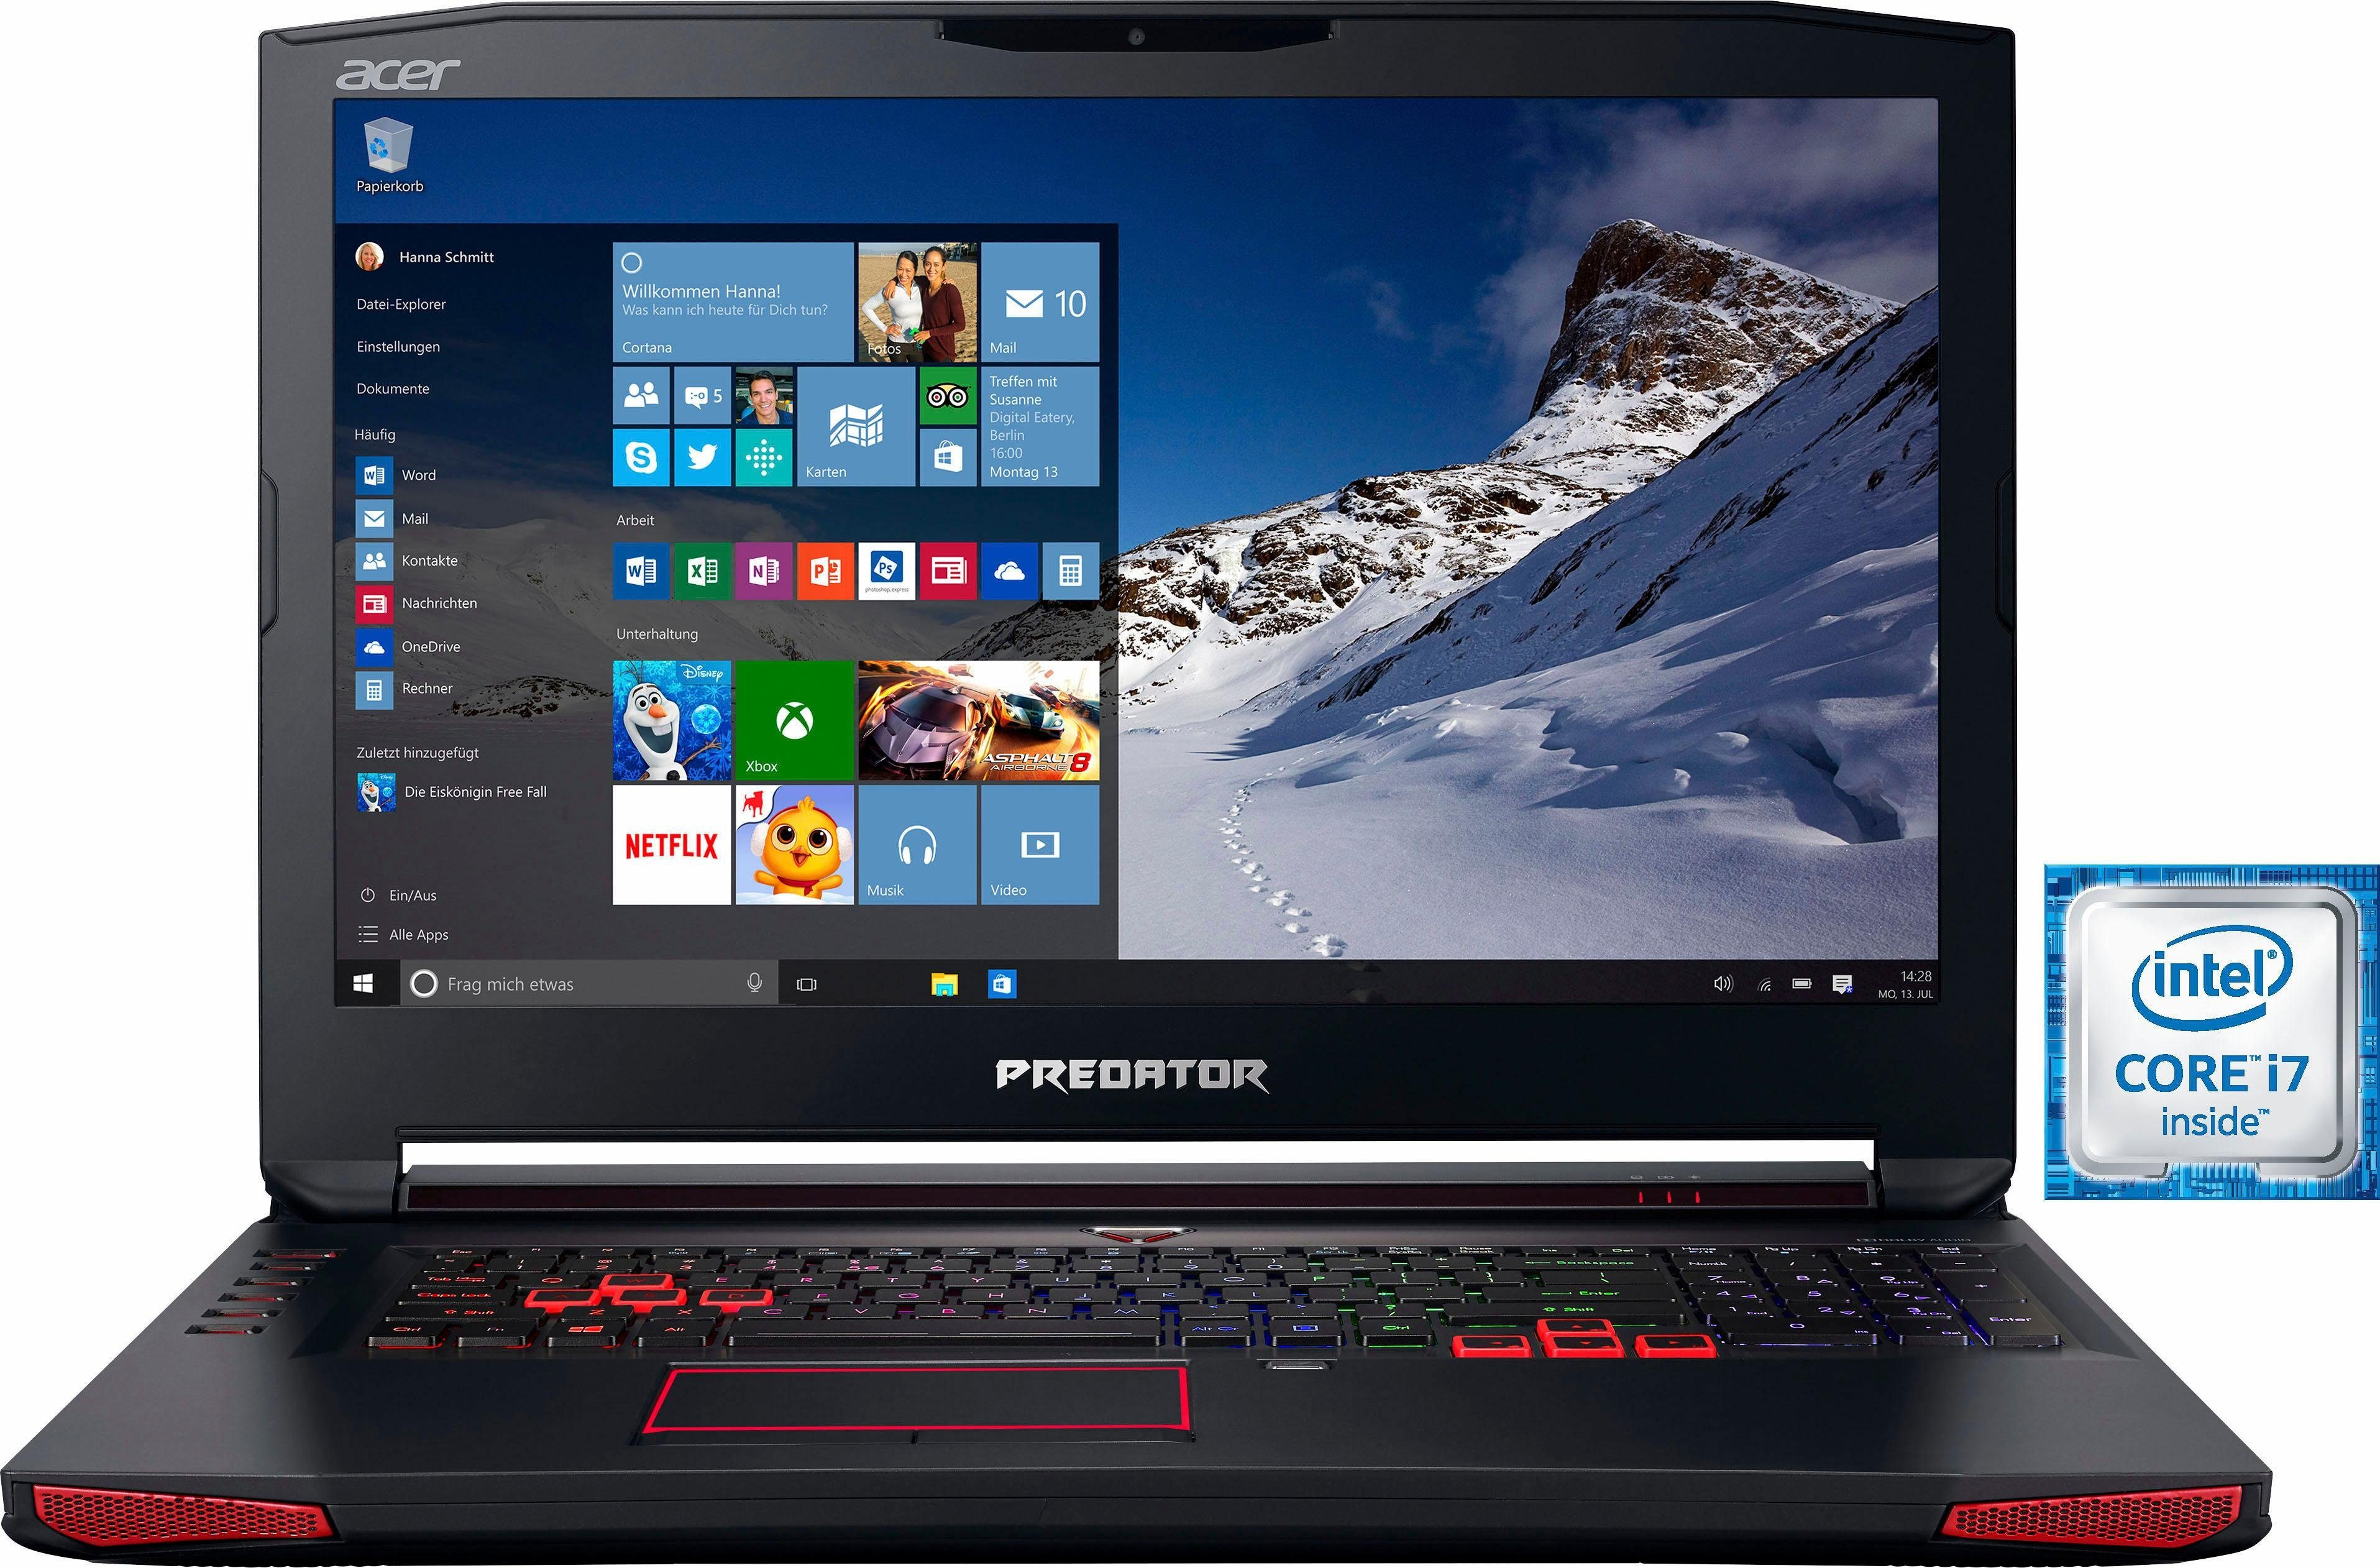 Acer Predator 17 (G9-793-75DL) Notebook, Intel® Core™ i7, 43,9 cm (17,3 Zoll), 1128 GB Speicher